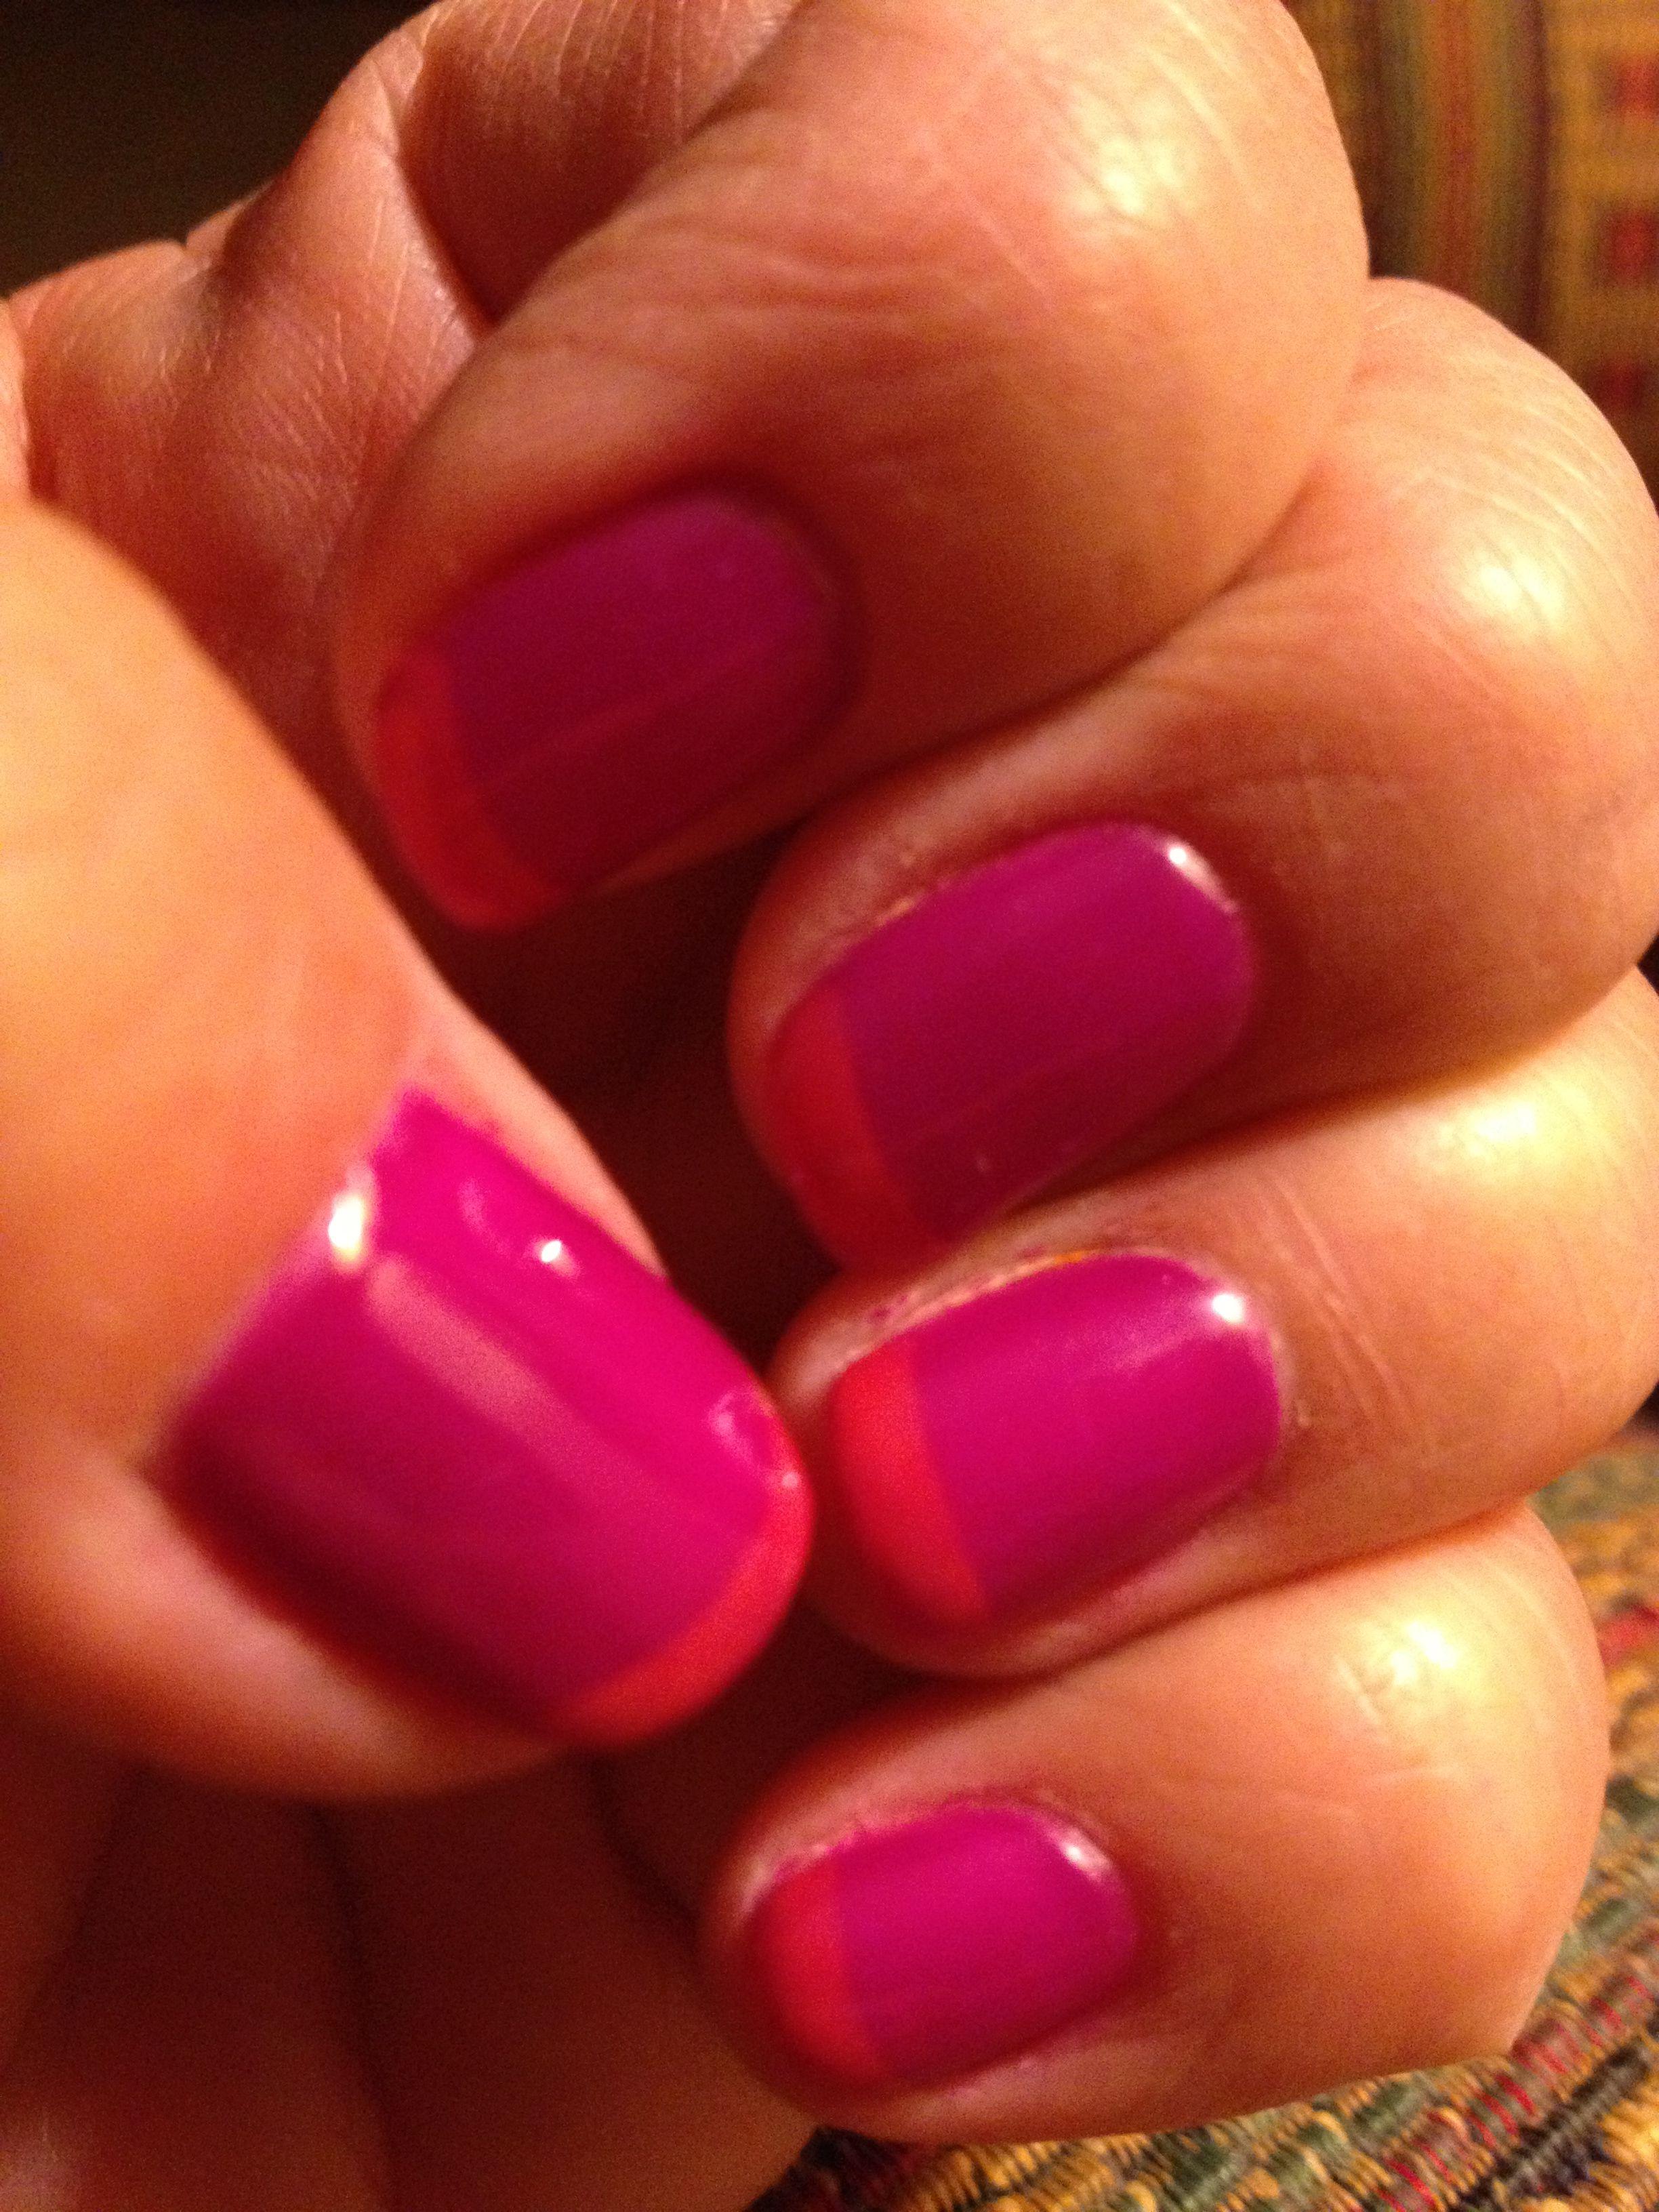 Fun summer French Mani....pink and neon orange! Loving it!